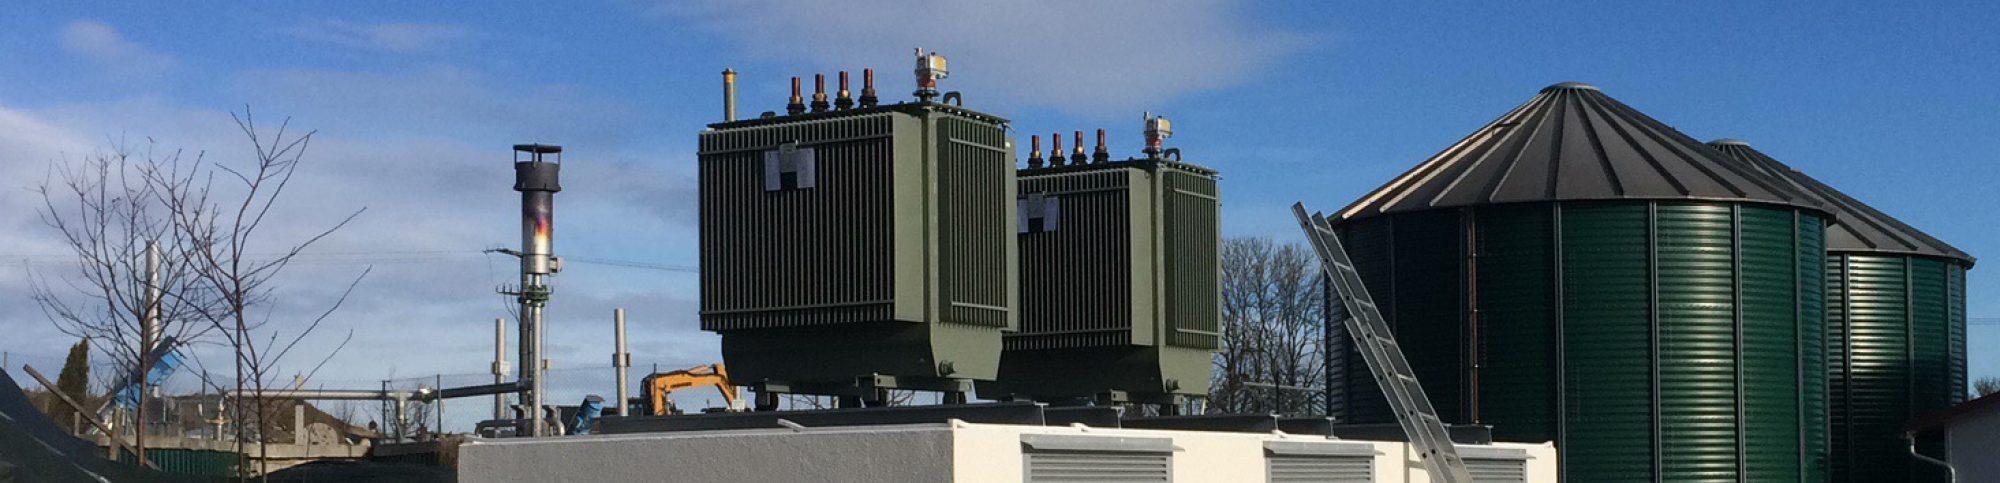 Ing.-Büro für Elektotechnik